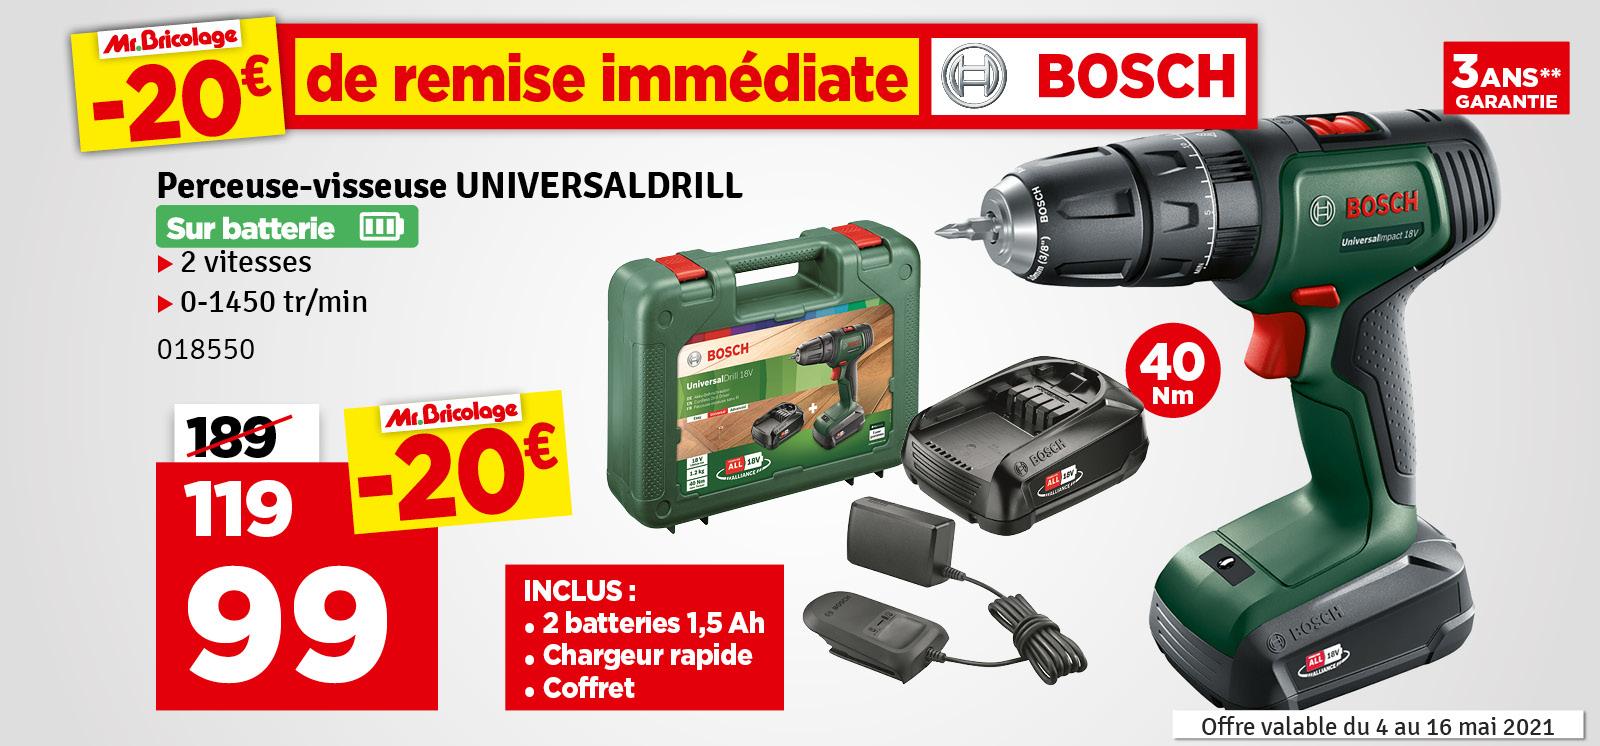 Promo - Perceuse visseuse sur batterie UniversalDrill 2 x 1,5 Ah 18 V BOSCH